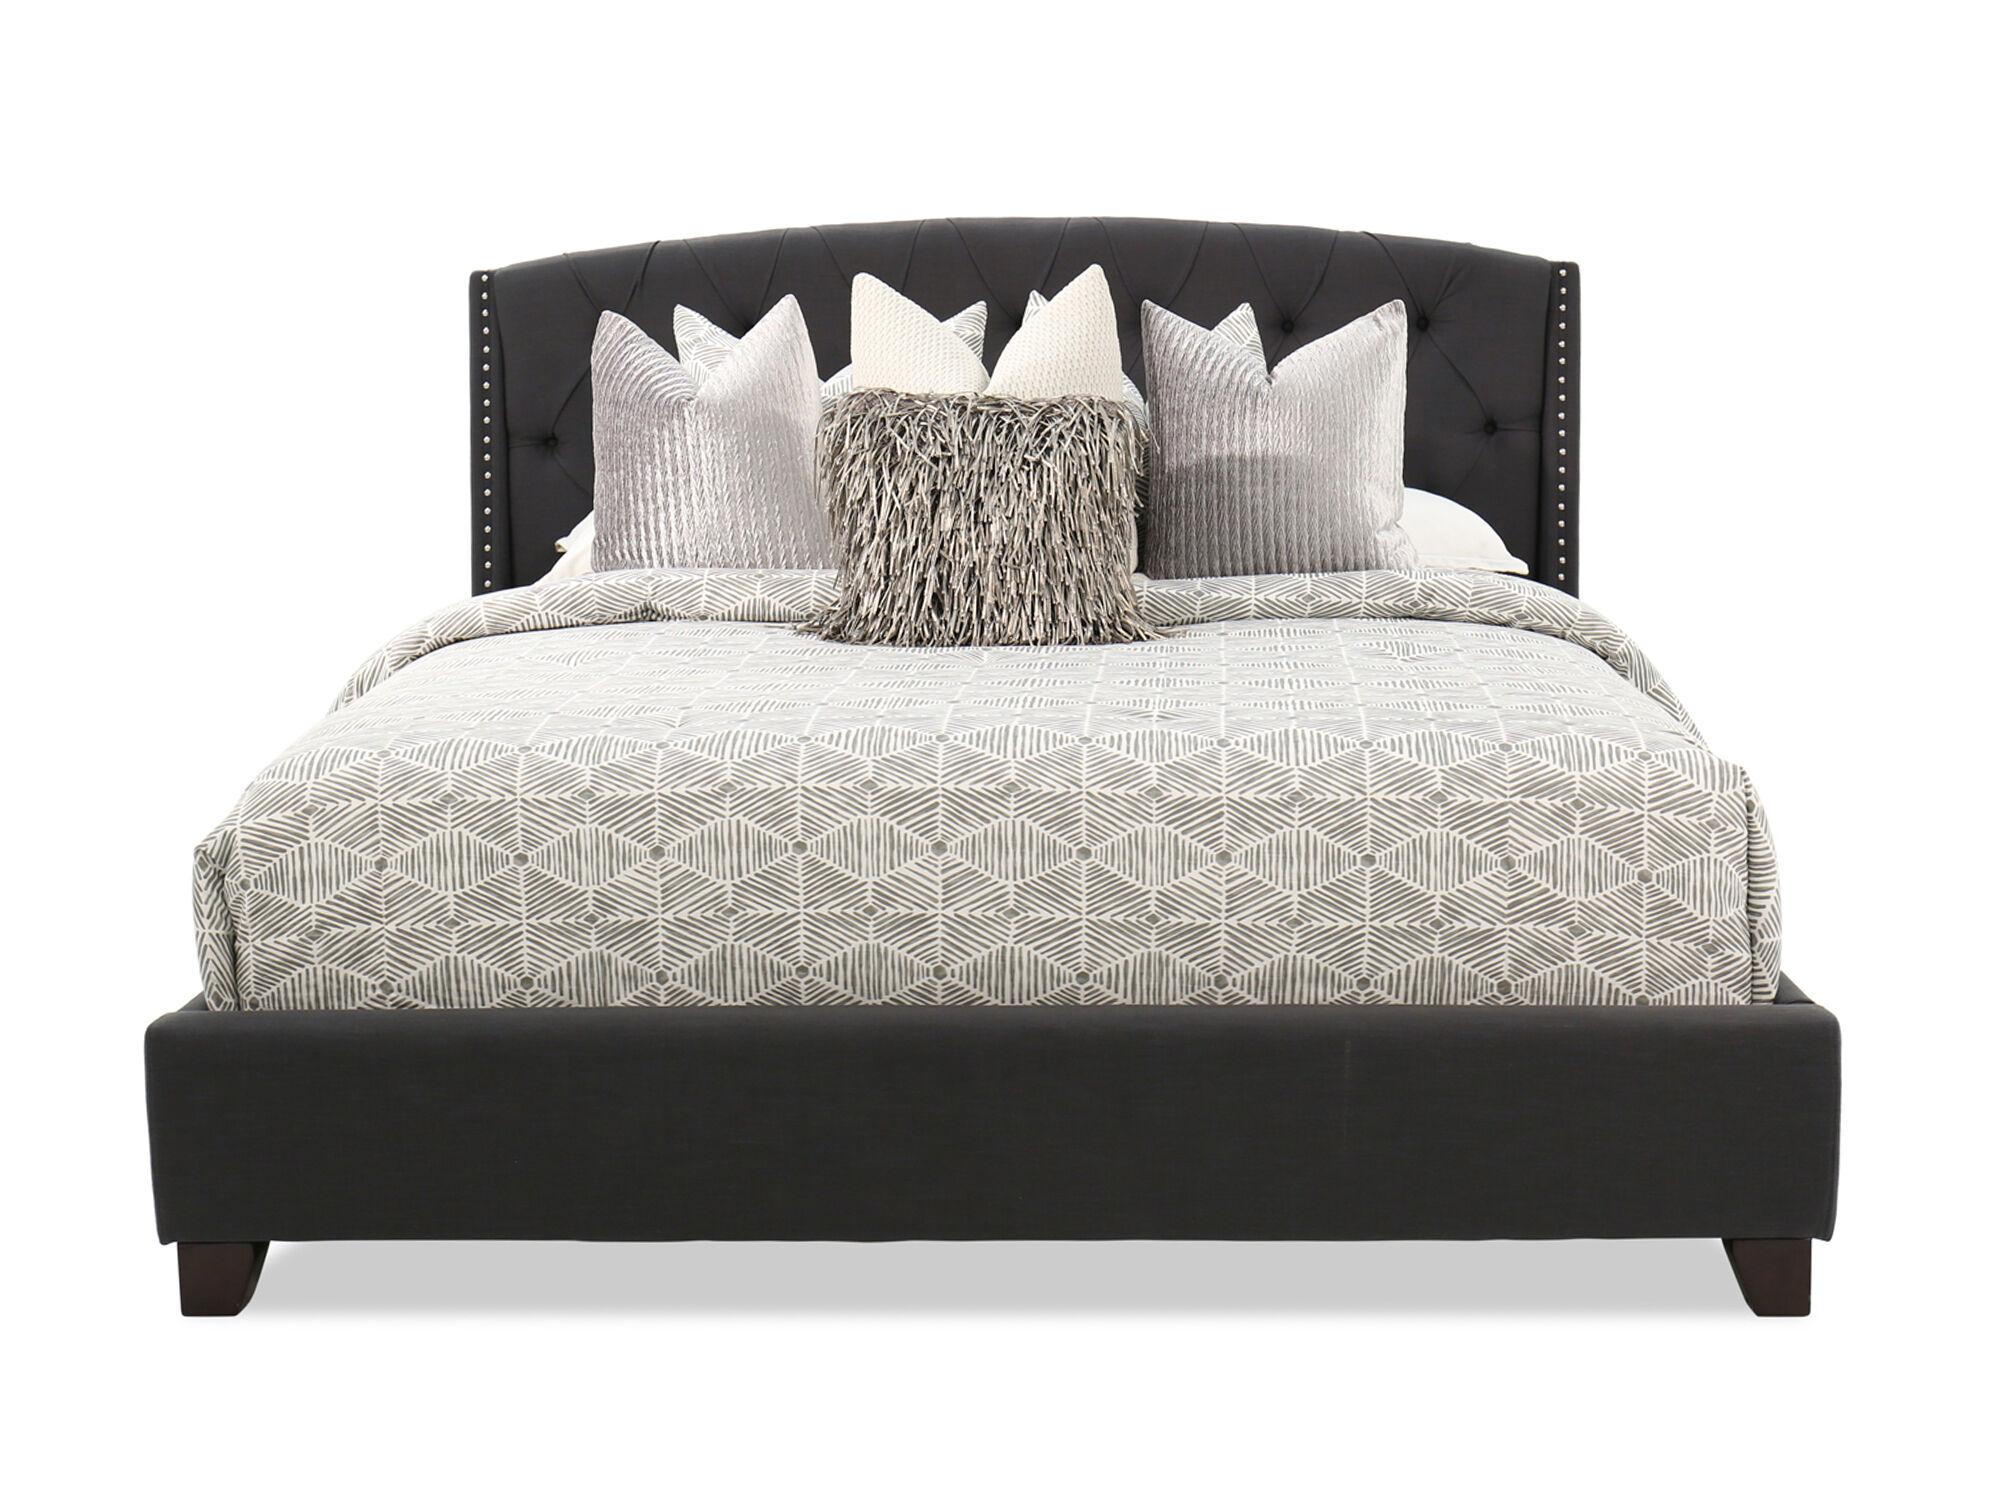 "55"" Contemporary Button Tufted Bed In Dark Gray"